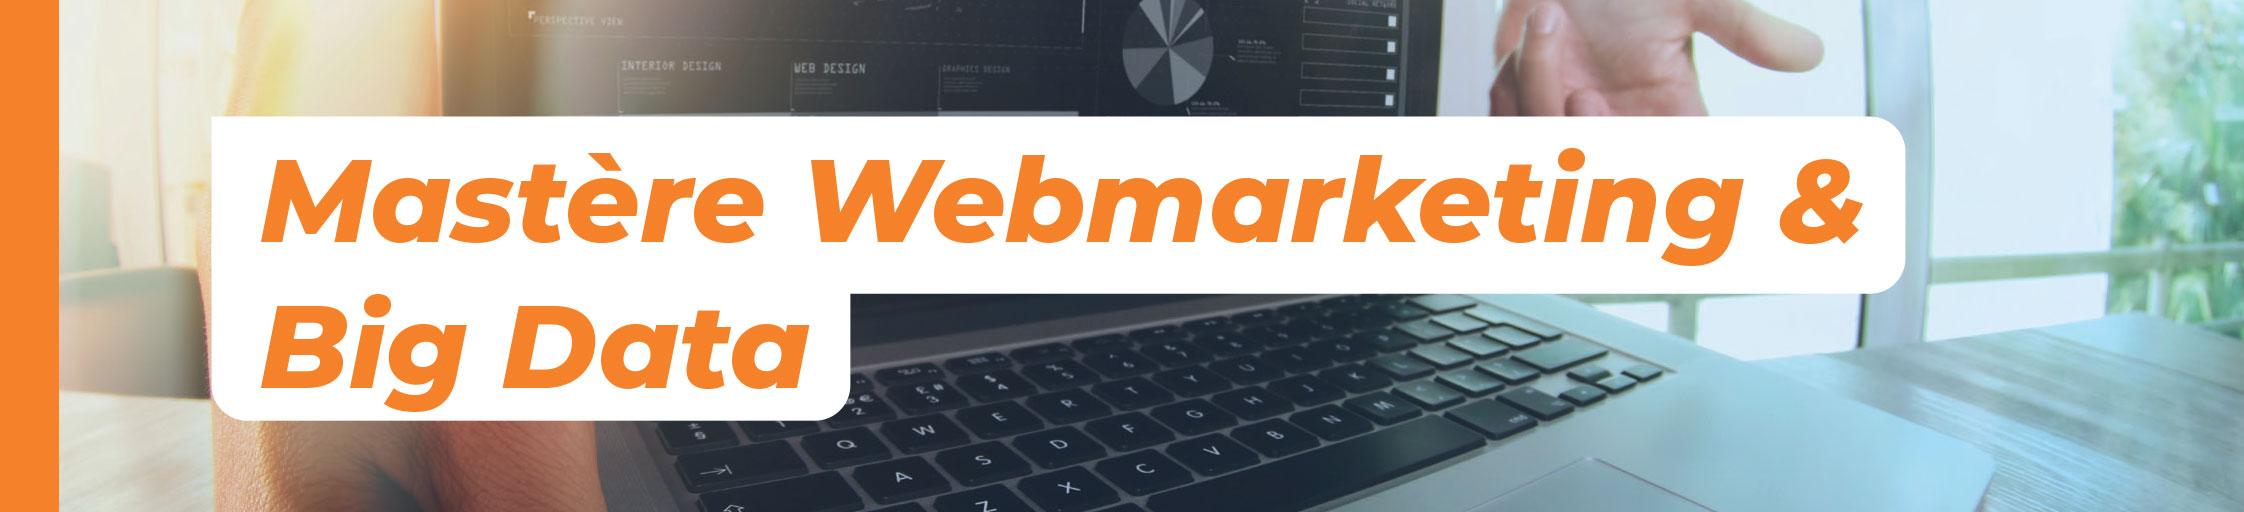 mastere webmarketing big data